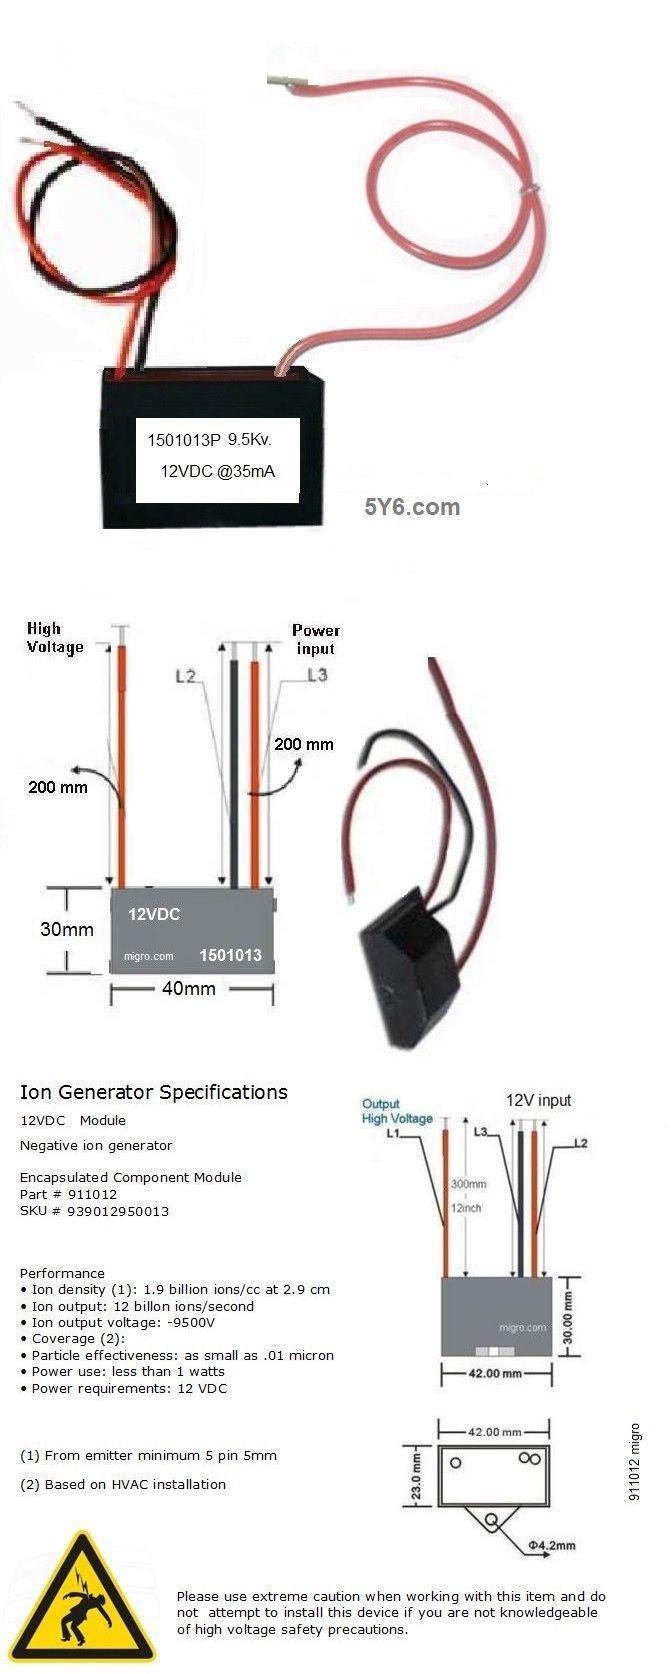 Air Purifiers 43510 12V Negative Ion Generator Module